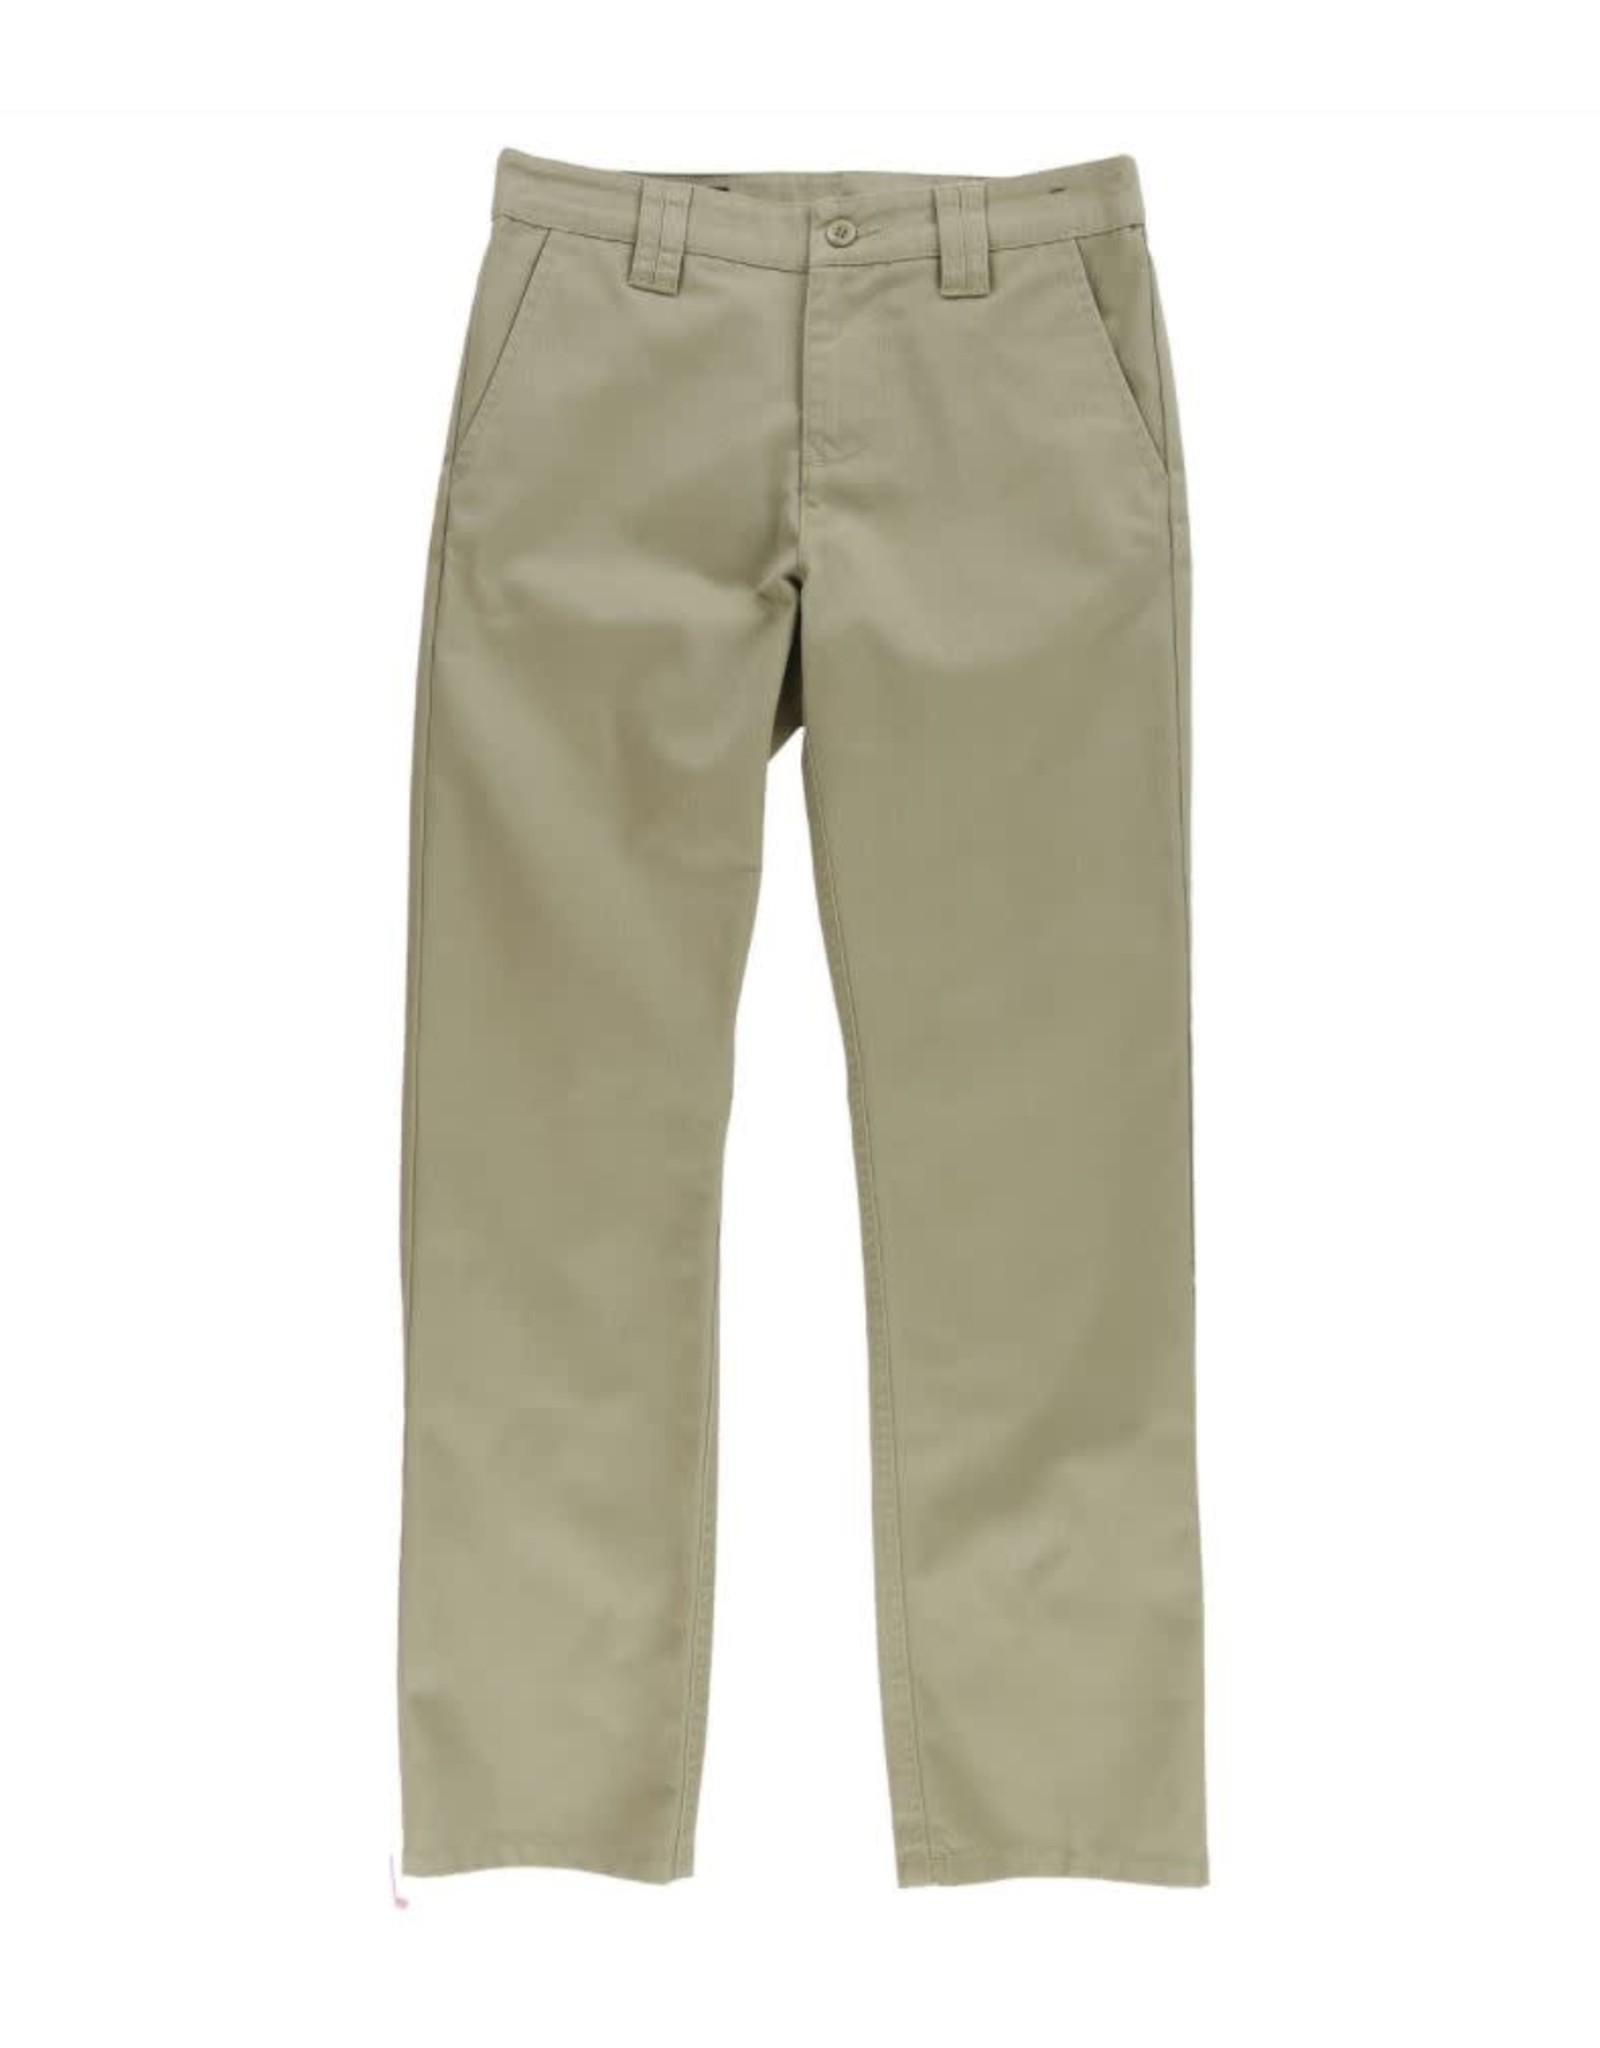 O'Neill Sportswear Contact Straight Pant